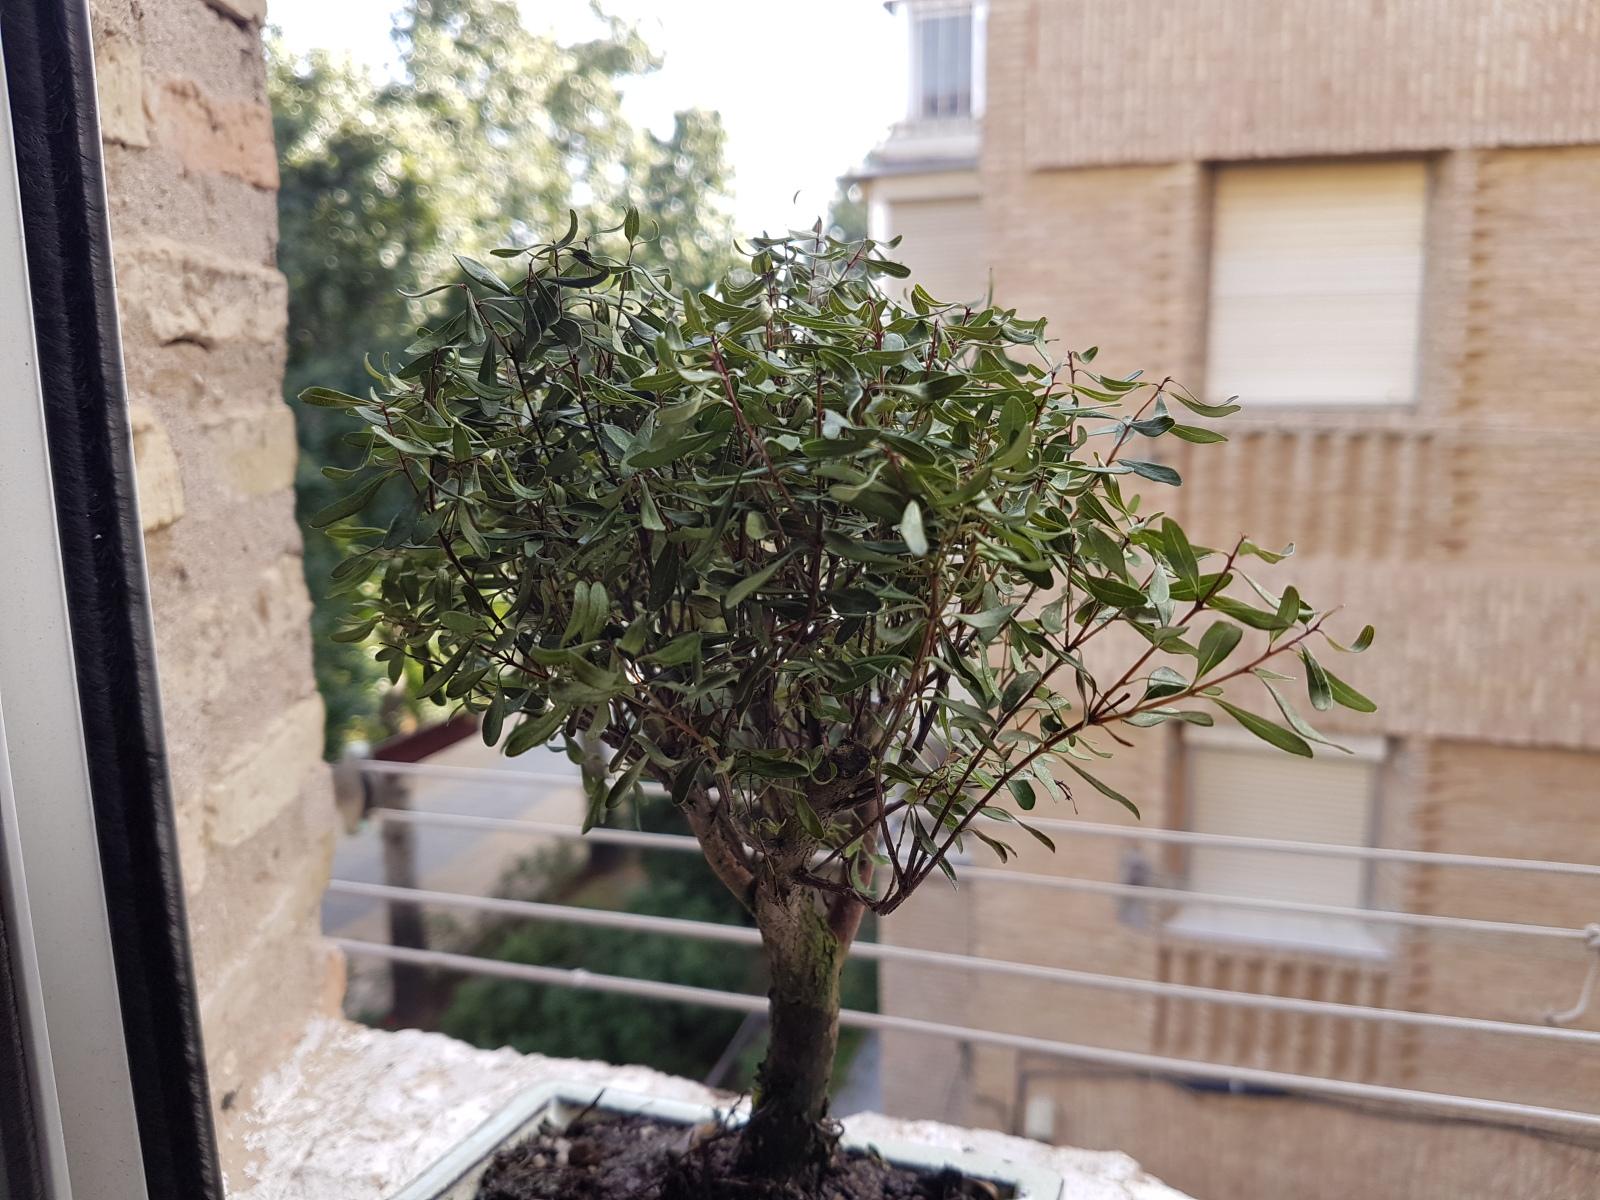 syzigium buxifolium Hojas rizadas 2qn2wsx